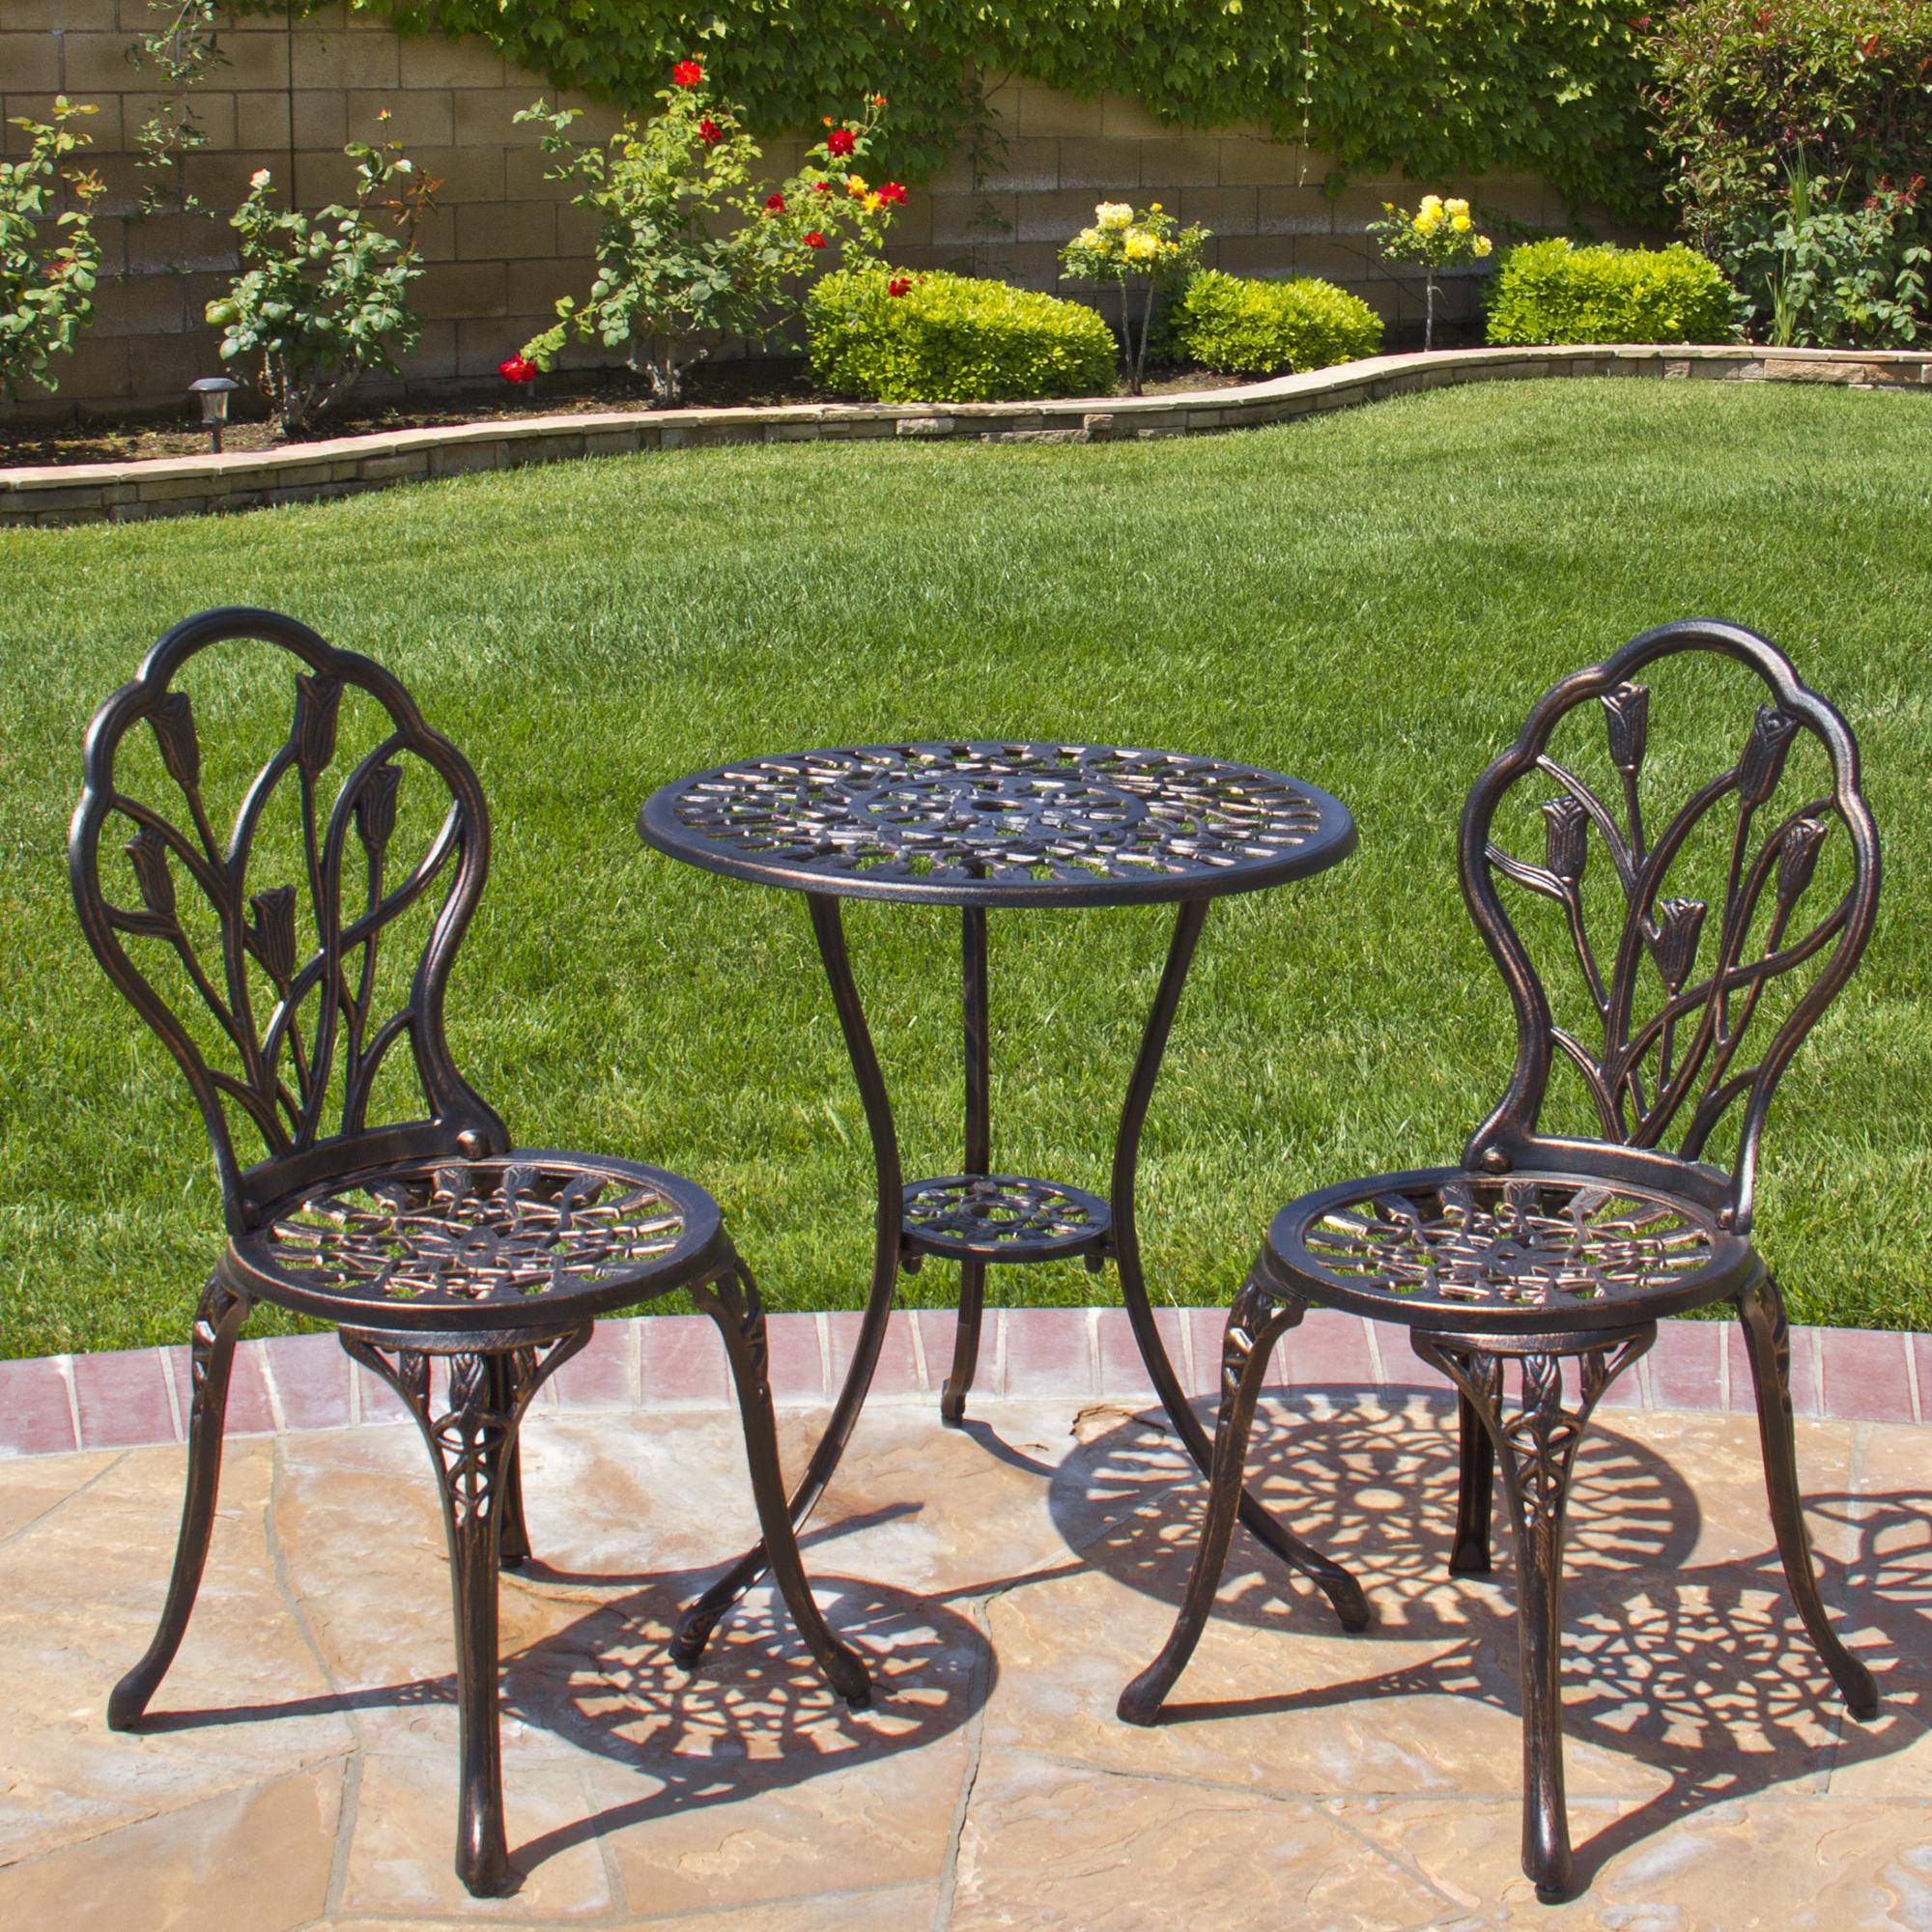 Cute Best Choice Products Cast Aluminum Patio Bistro Furniture Set in Antique  Copper cast aluminum bistro sets outdoor